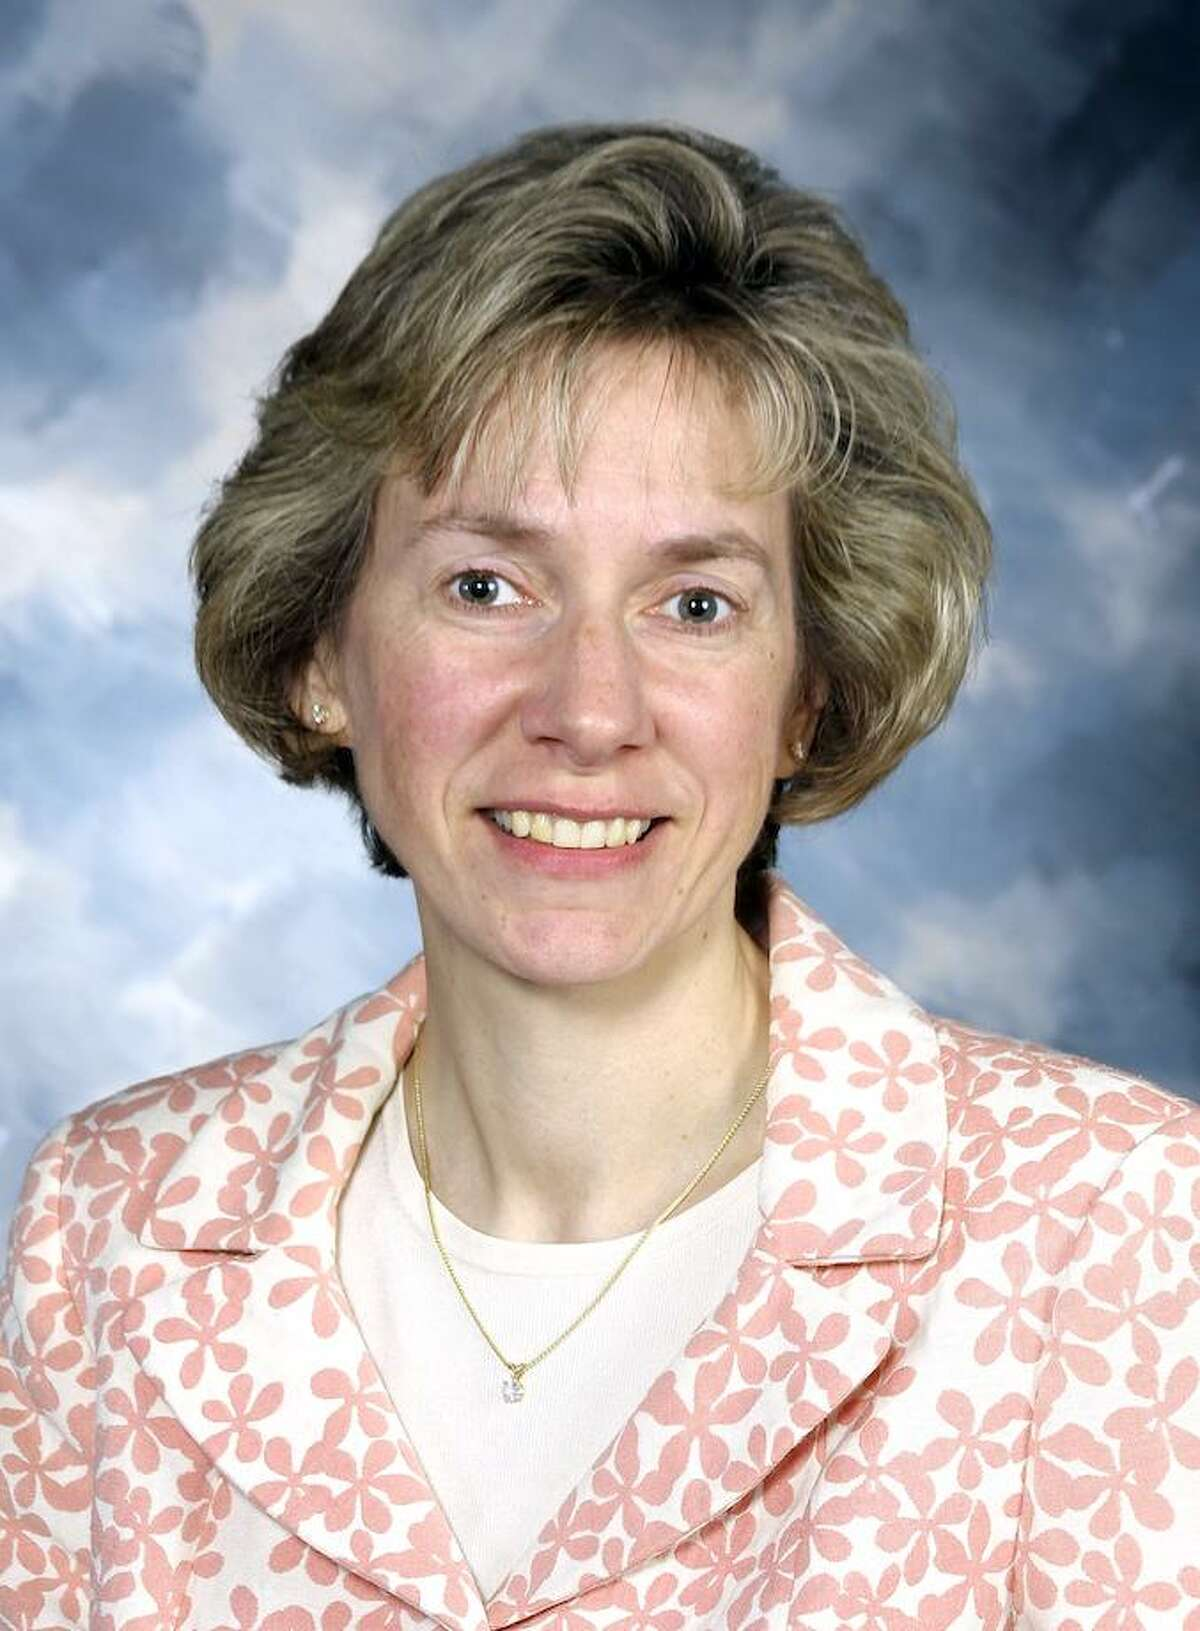 Dr. Alicia M. Roy, Superintendent, New Fairfield Public Schools